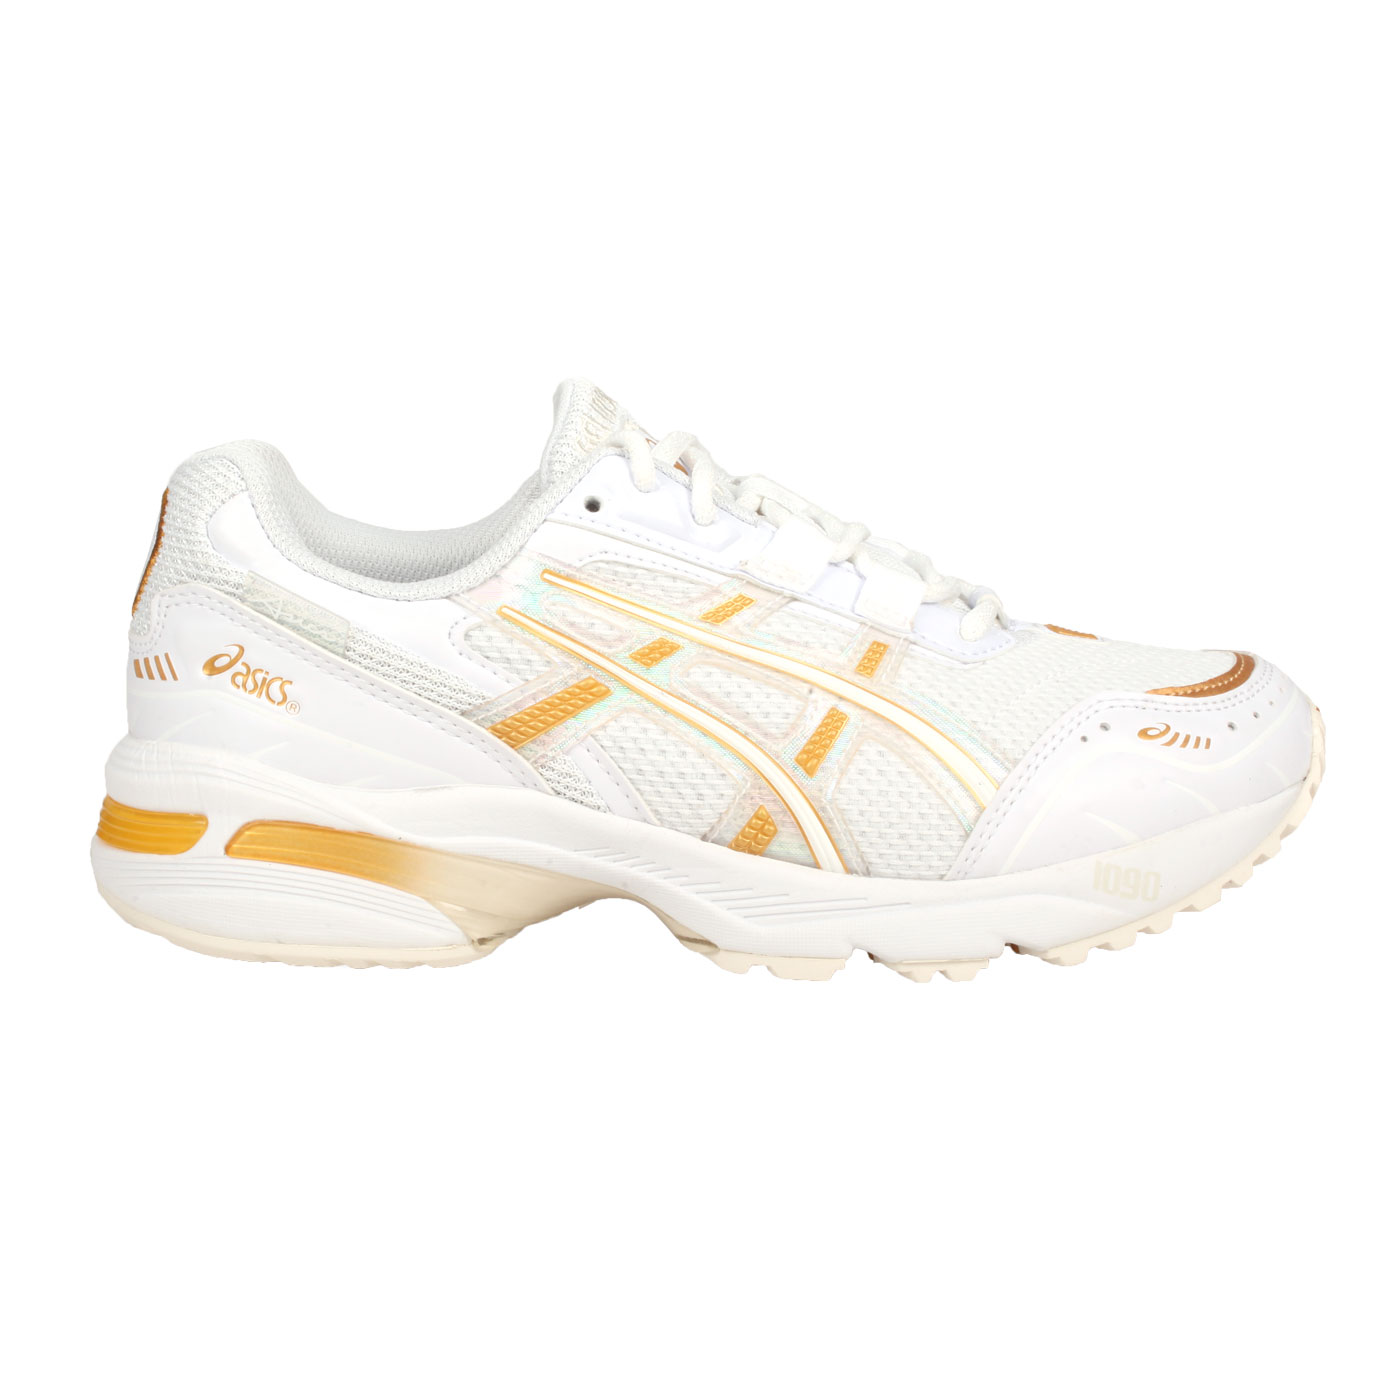 ASICS 女款休閒運動鞋  @GEL-1090@1202A019-100 - 白金